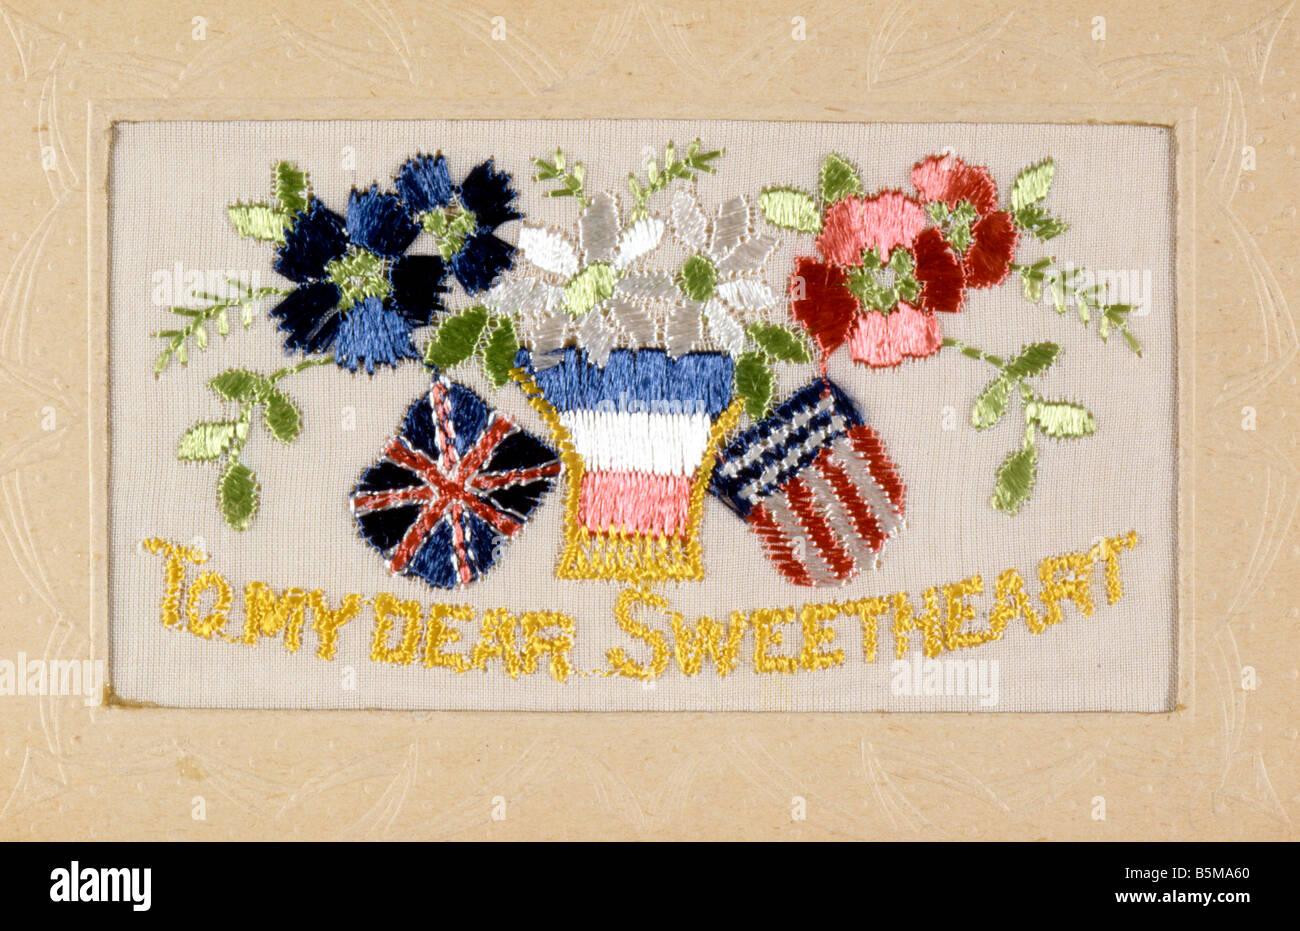 2 G55 P1 1918 13 E To my dear sweetheart Postcard 1918 History World War I Propaganda To my dear sweetheart Flags - Stock Image